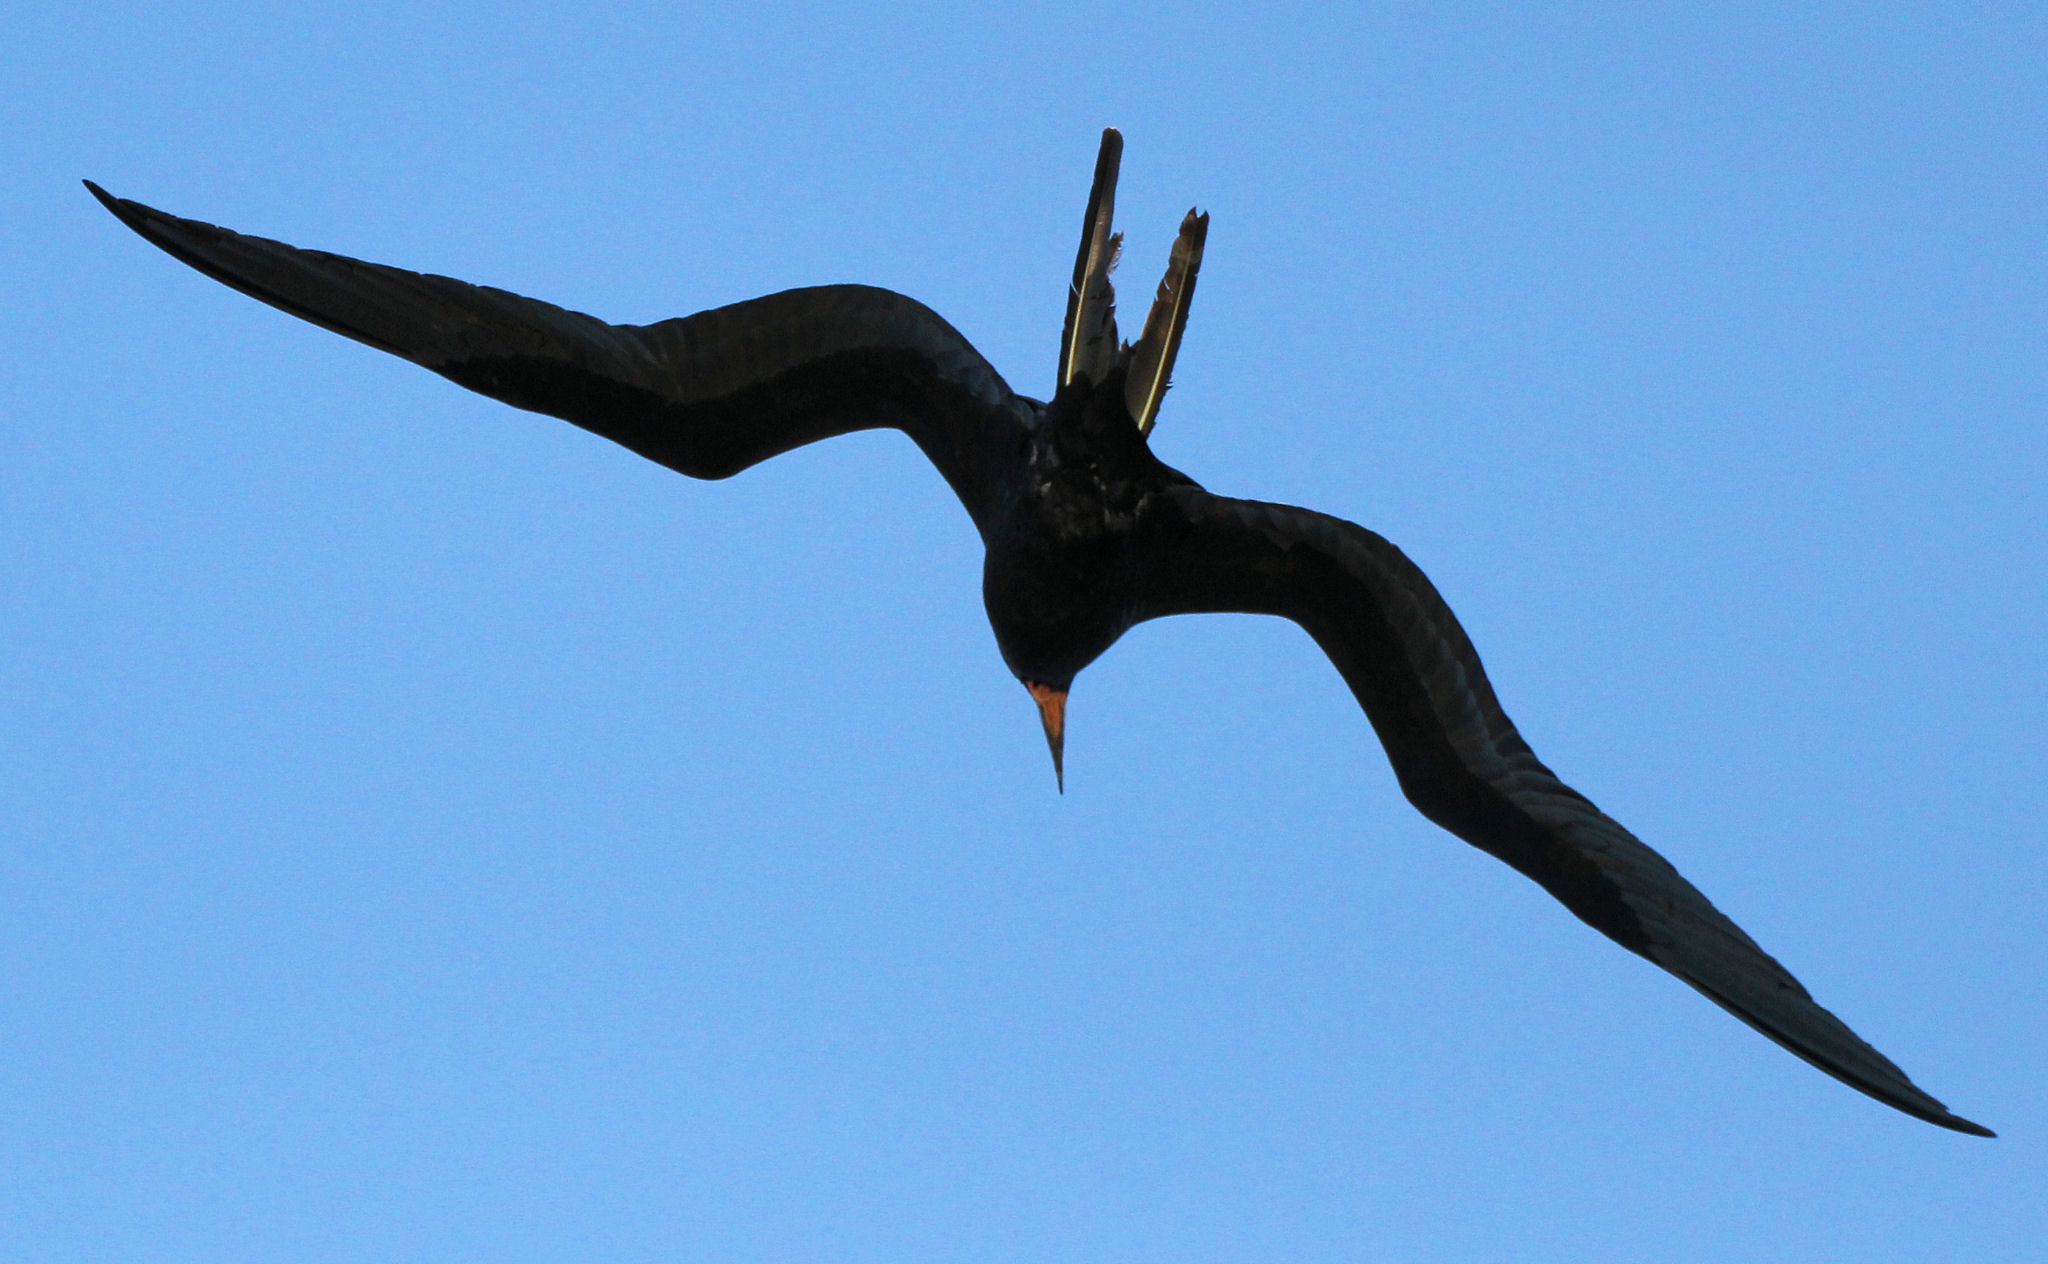 adult male magnificent frigatebird approaching 06 - Dry Tortugas, FL - 2012-04-26